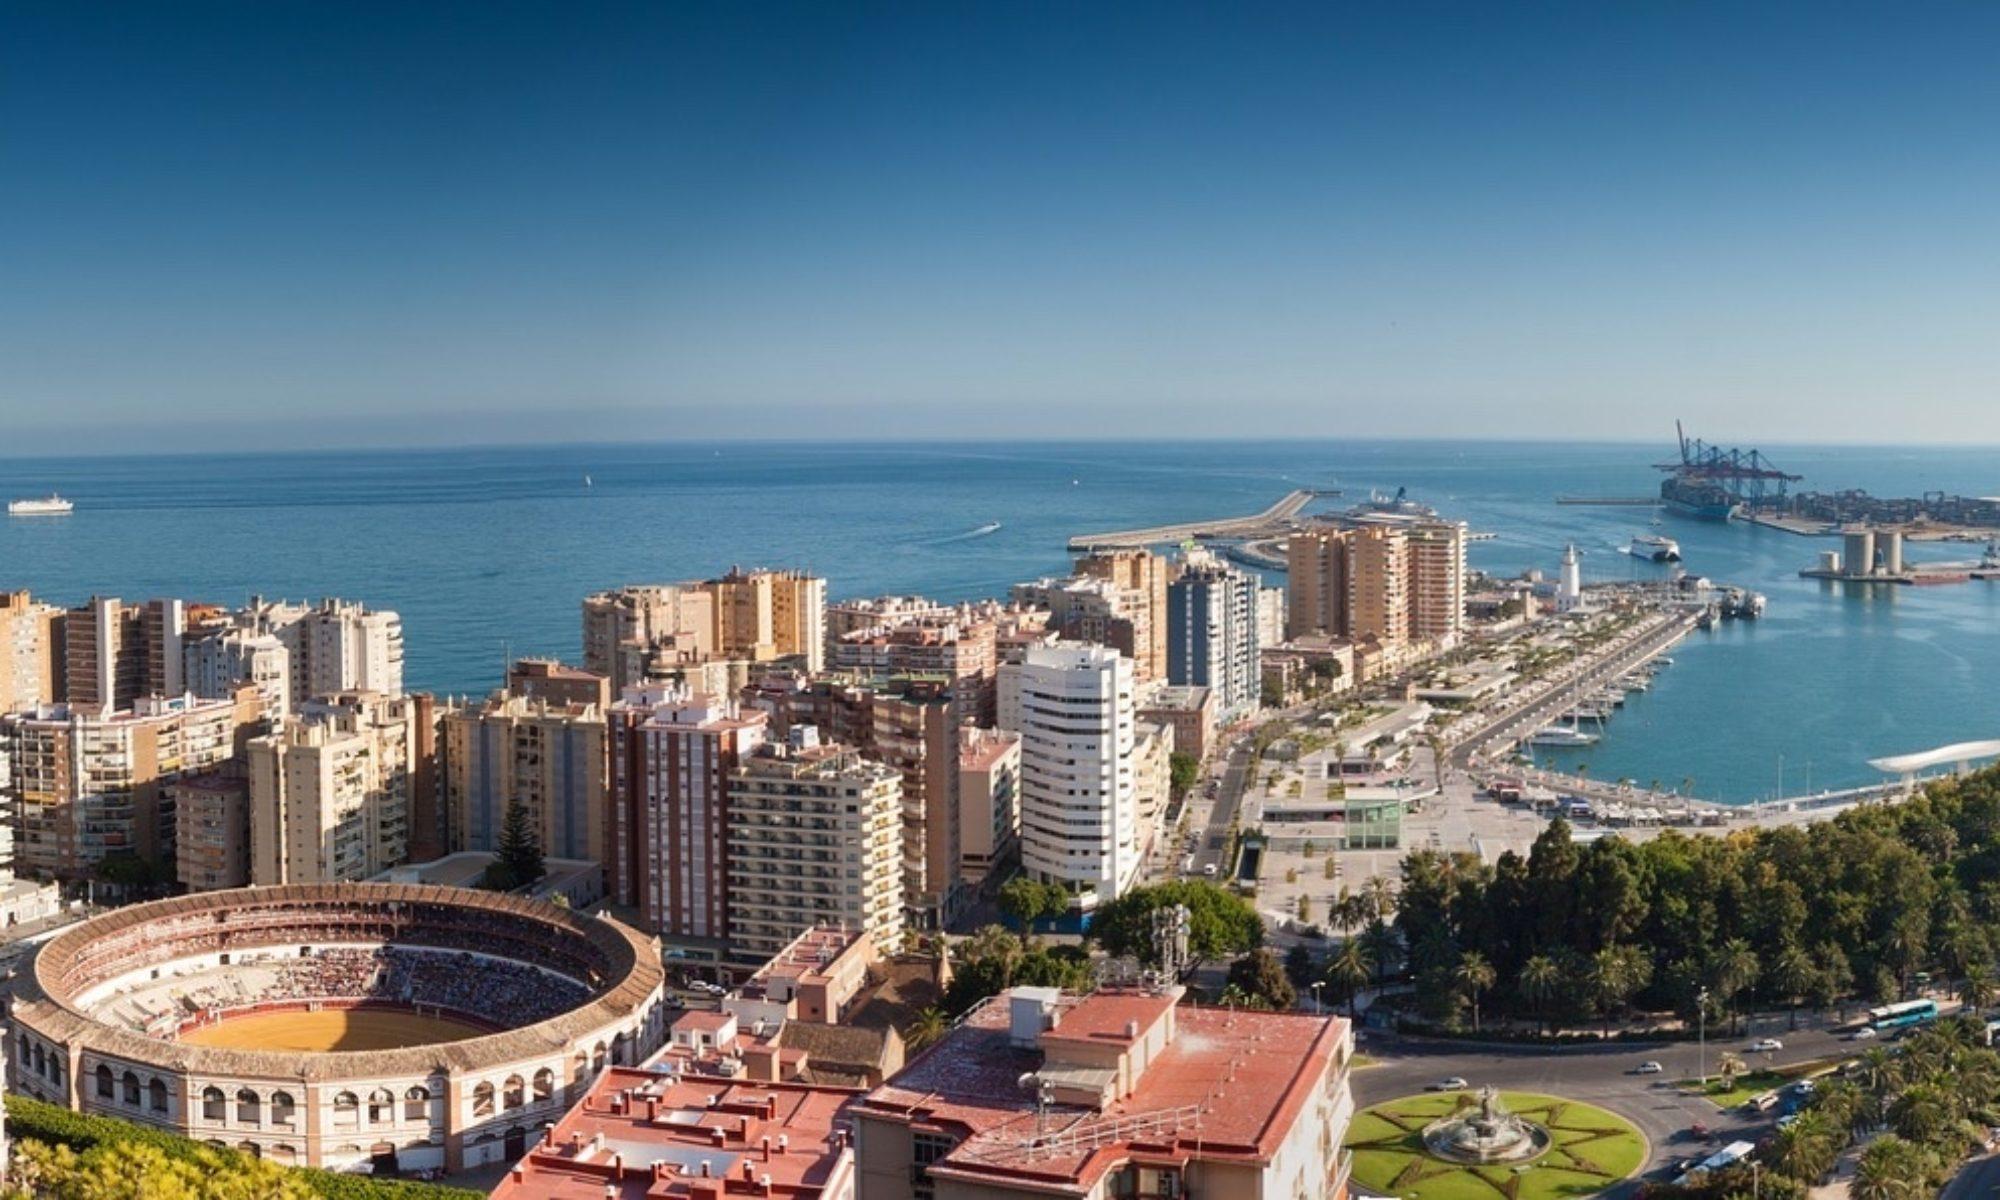 Hoy Malaga